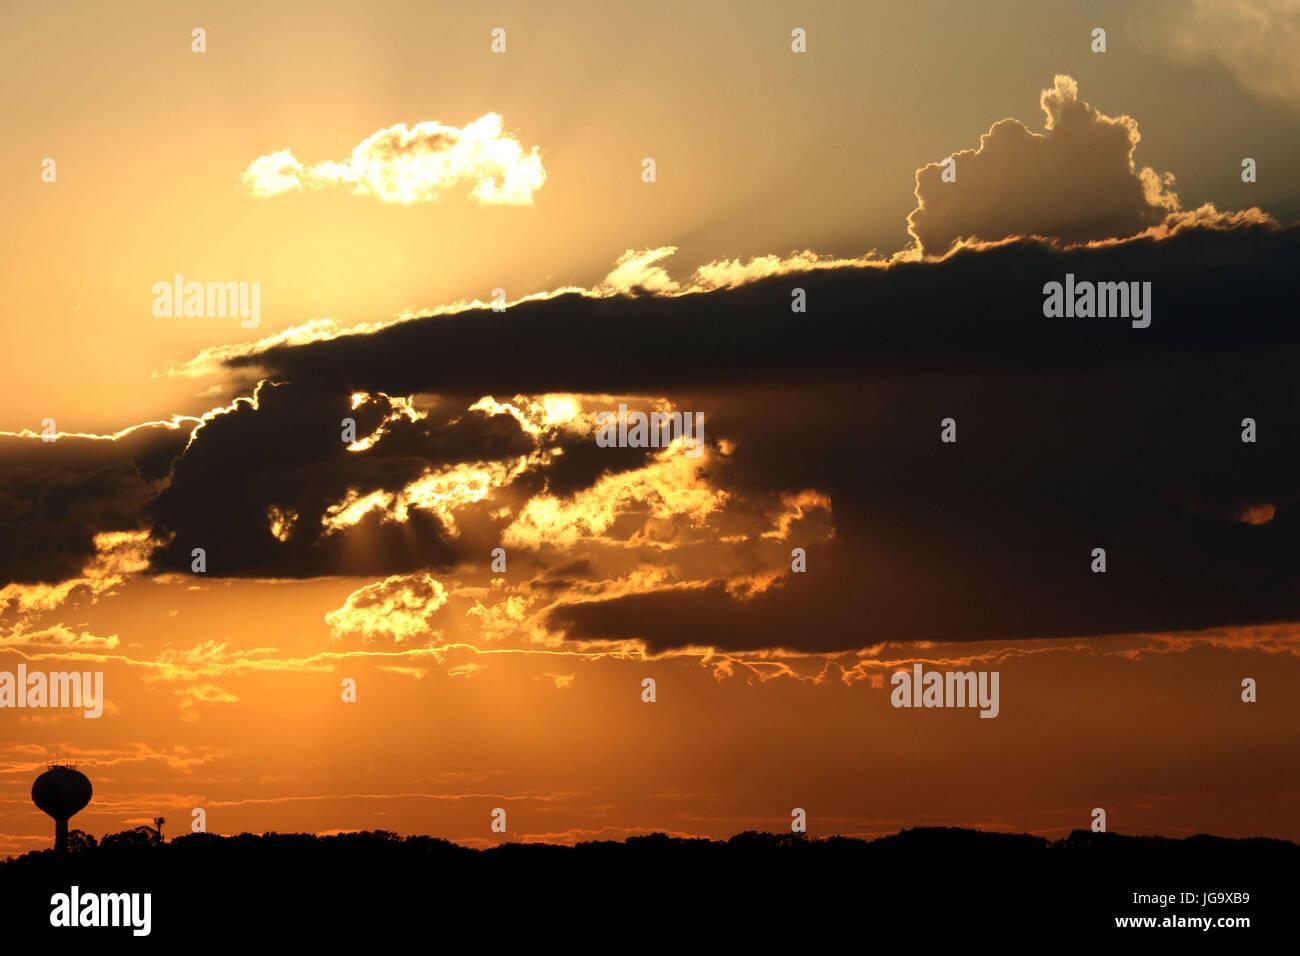 Sun peeks thru clouds during sundown with water tower - Stock Image